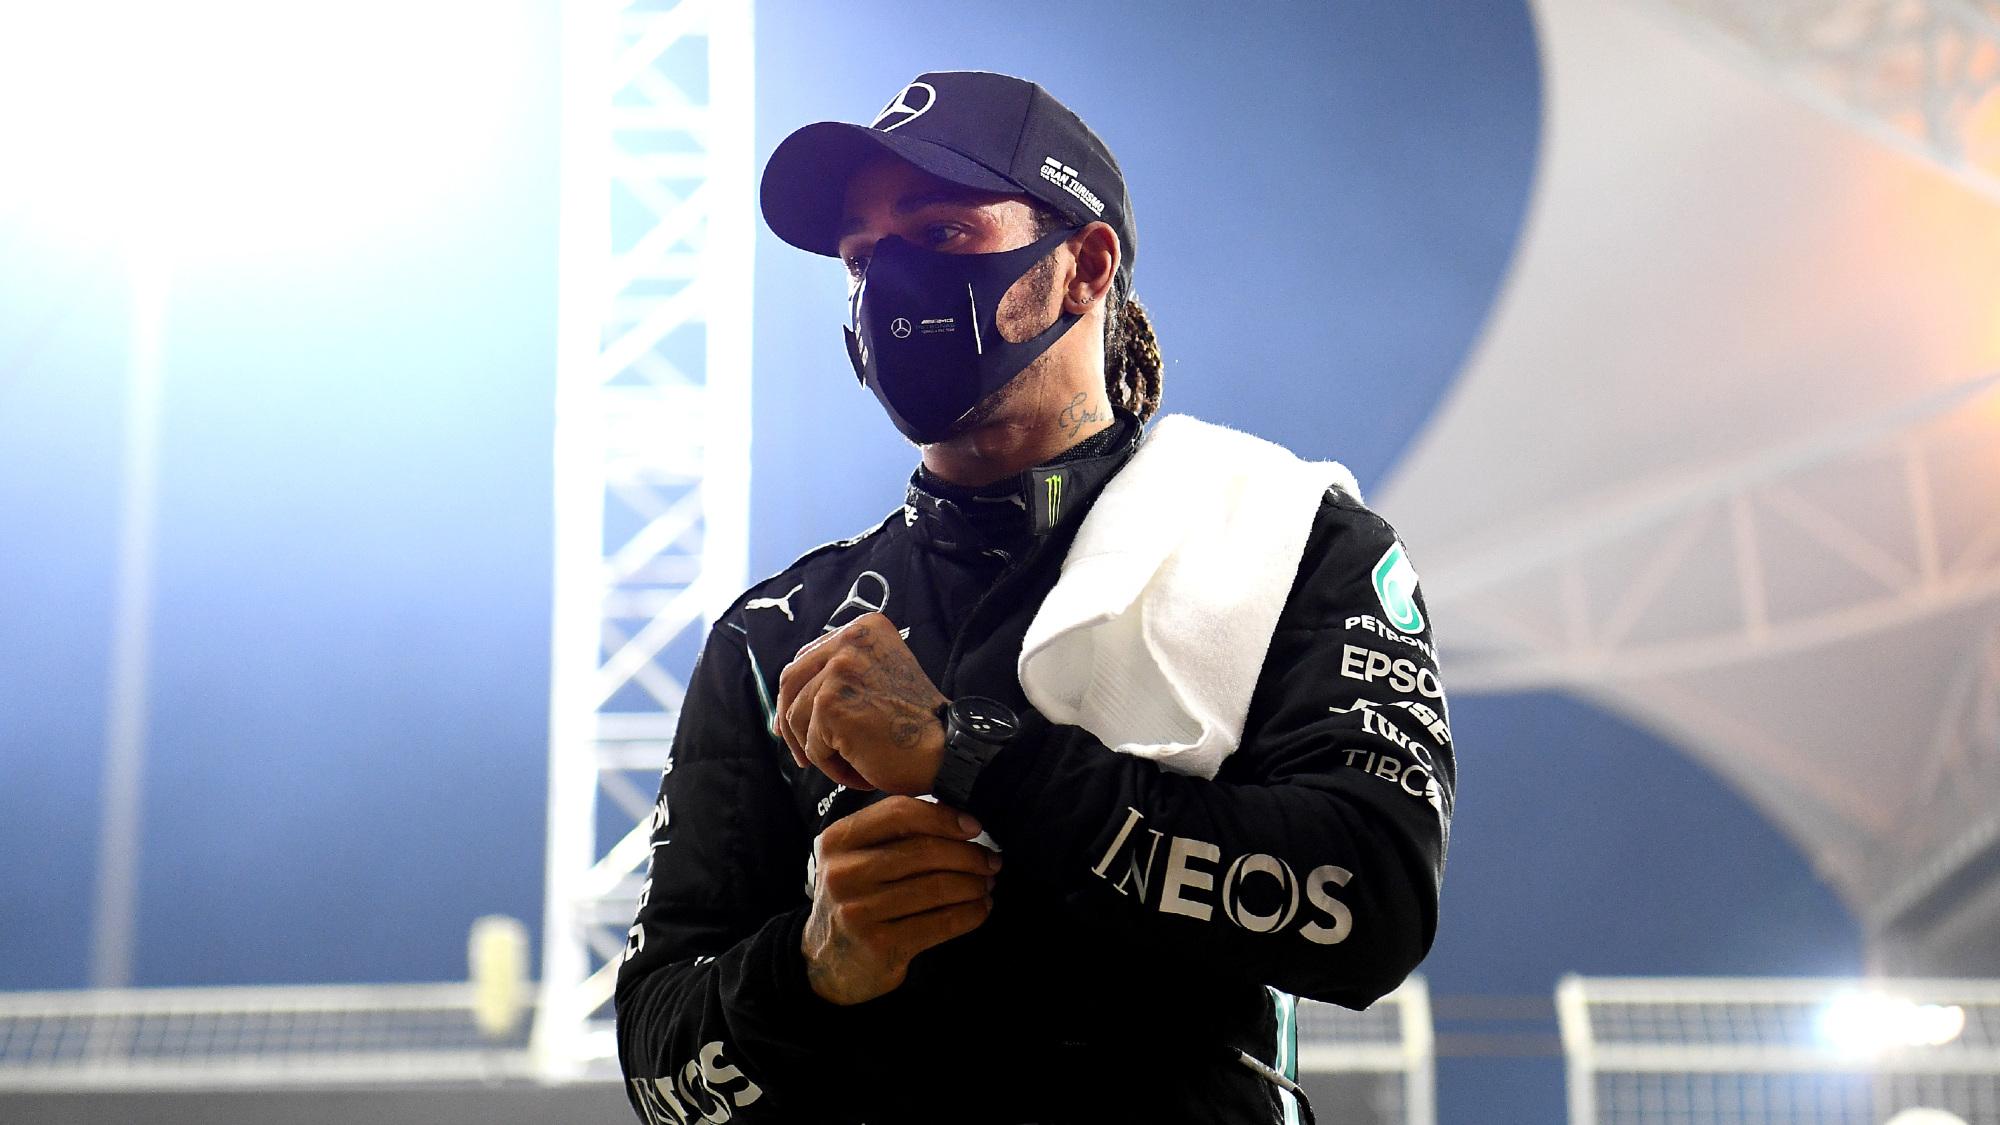 Why did it take so long? The Hamilton-Mercedes contract saga